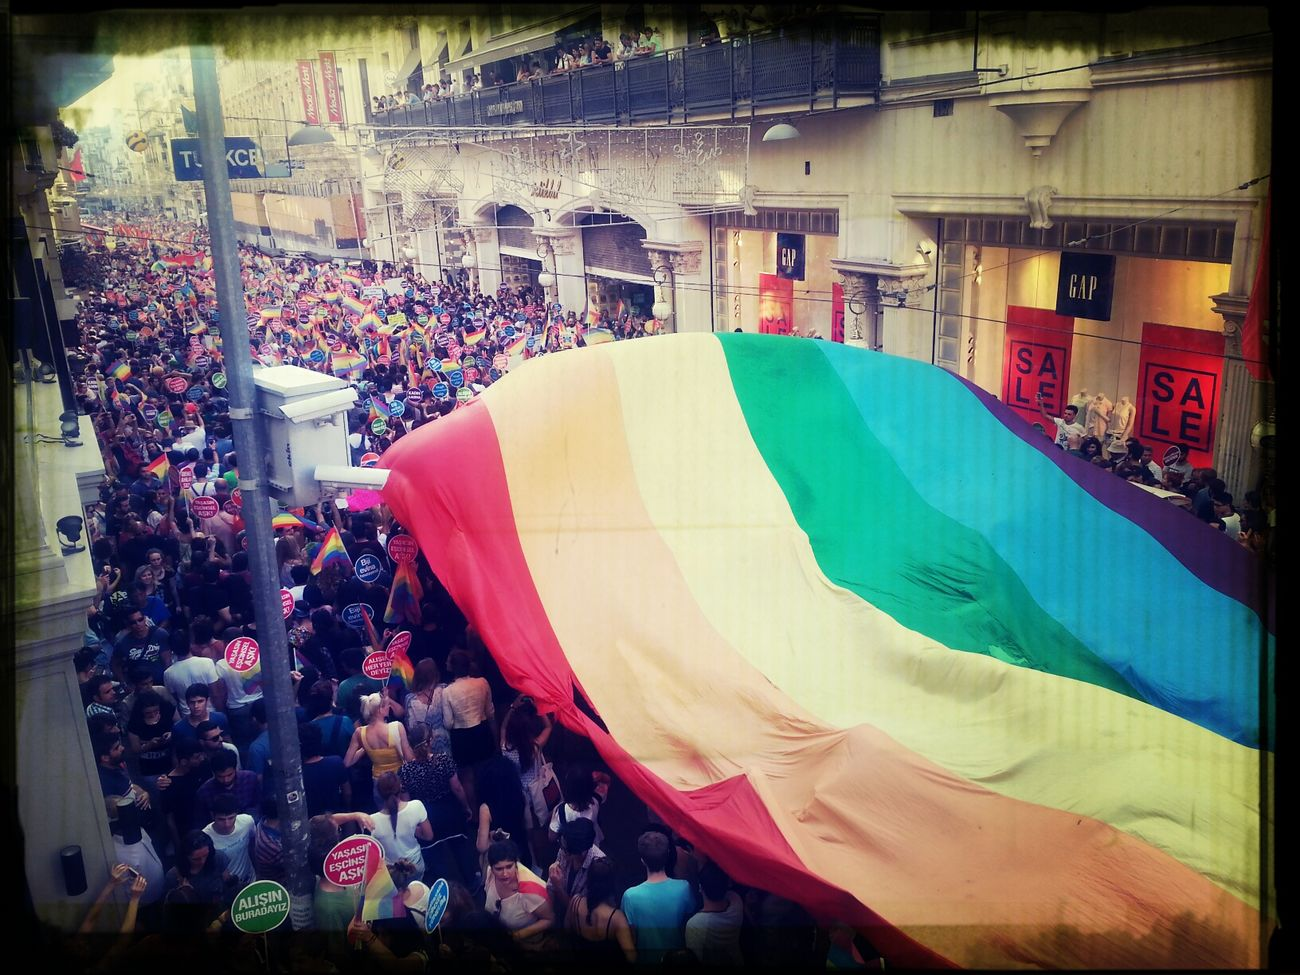 Music Festival Moments By Fltr Magazine 21st ıstanbul Lgbt Pride